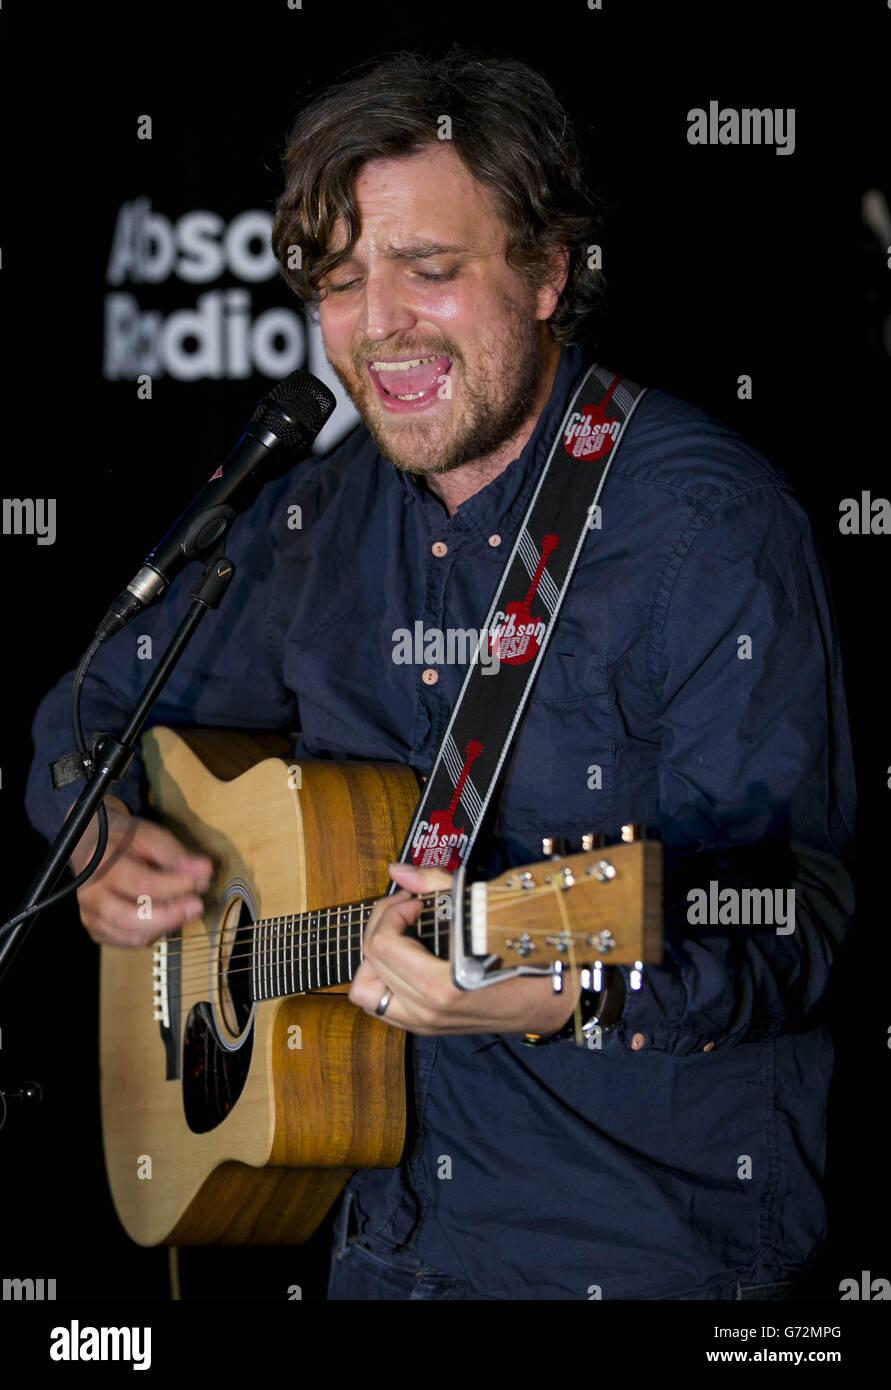 James Walsh secret gig - London - Stock Image